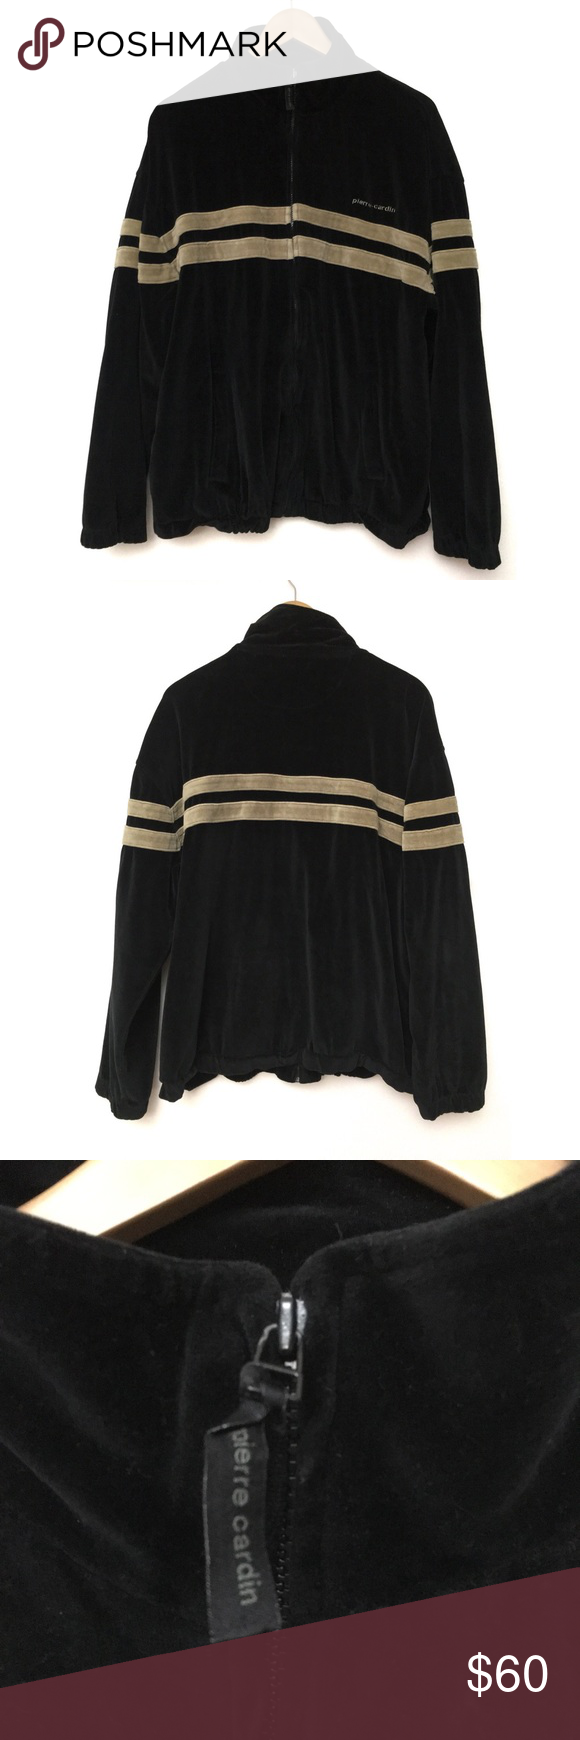 Vintage 90s Pierre Cardin Velour Track Jacket Track Jackets Pierre Cardin Men S Coats And Jackets